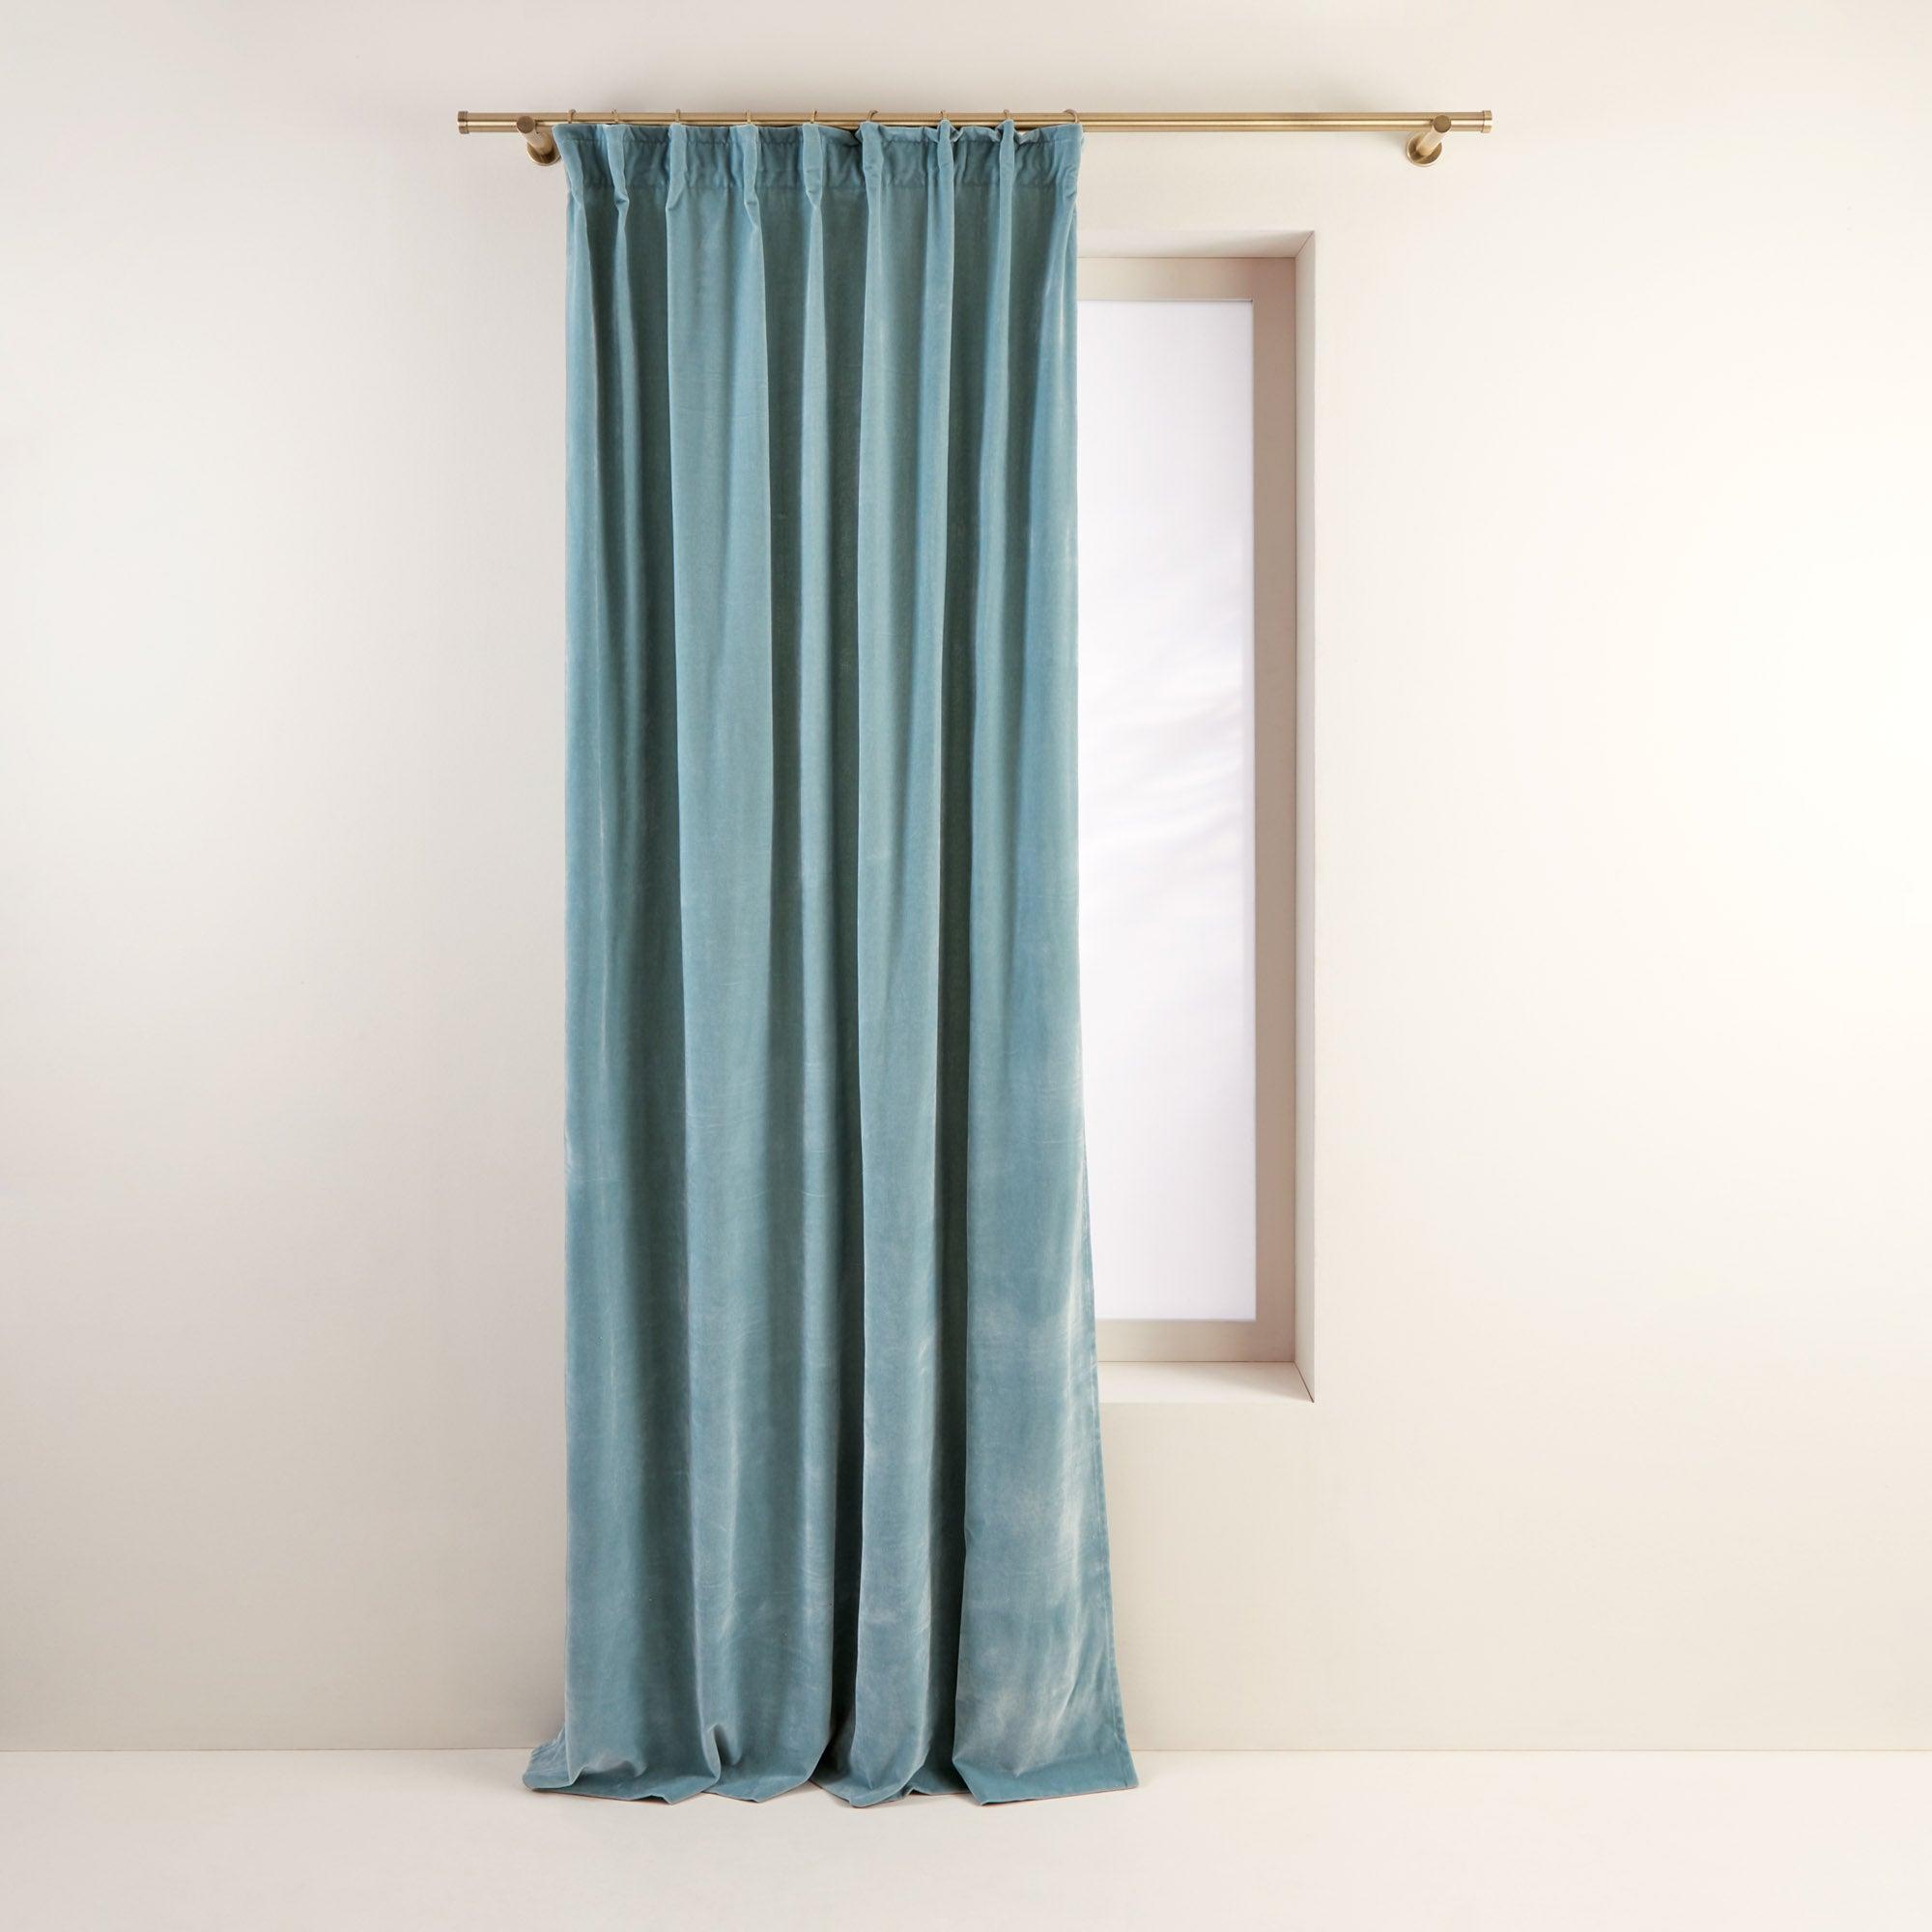 Rideau à ruban fronceur DARIO 134x280 cm Vert pale